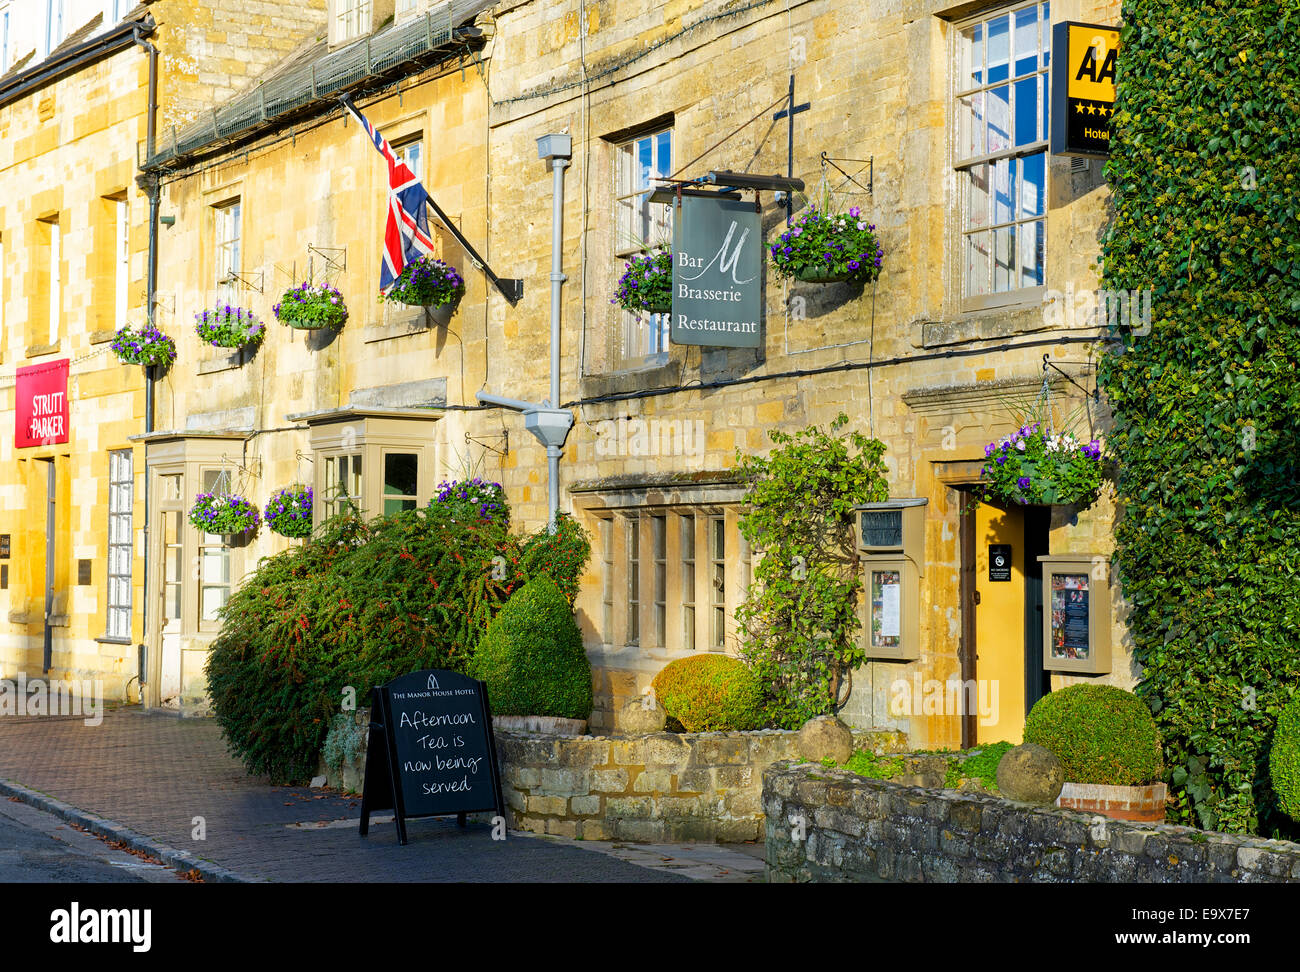 The Manor Hotel in Moreton-in-Marsh, Gloucestershire, England UK - Stock Image